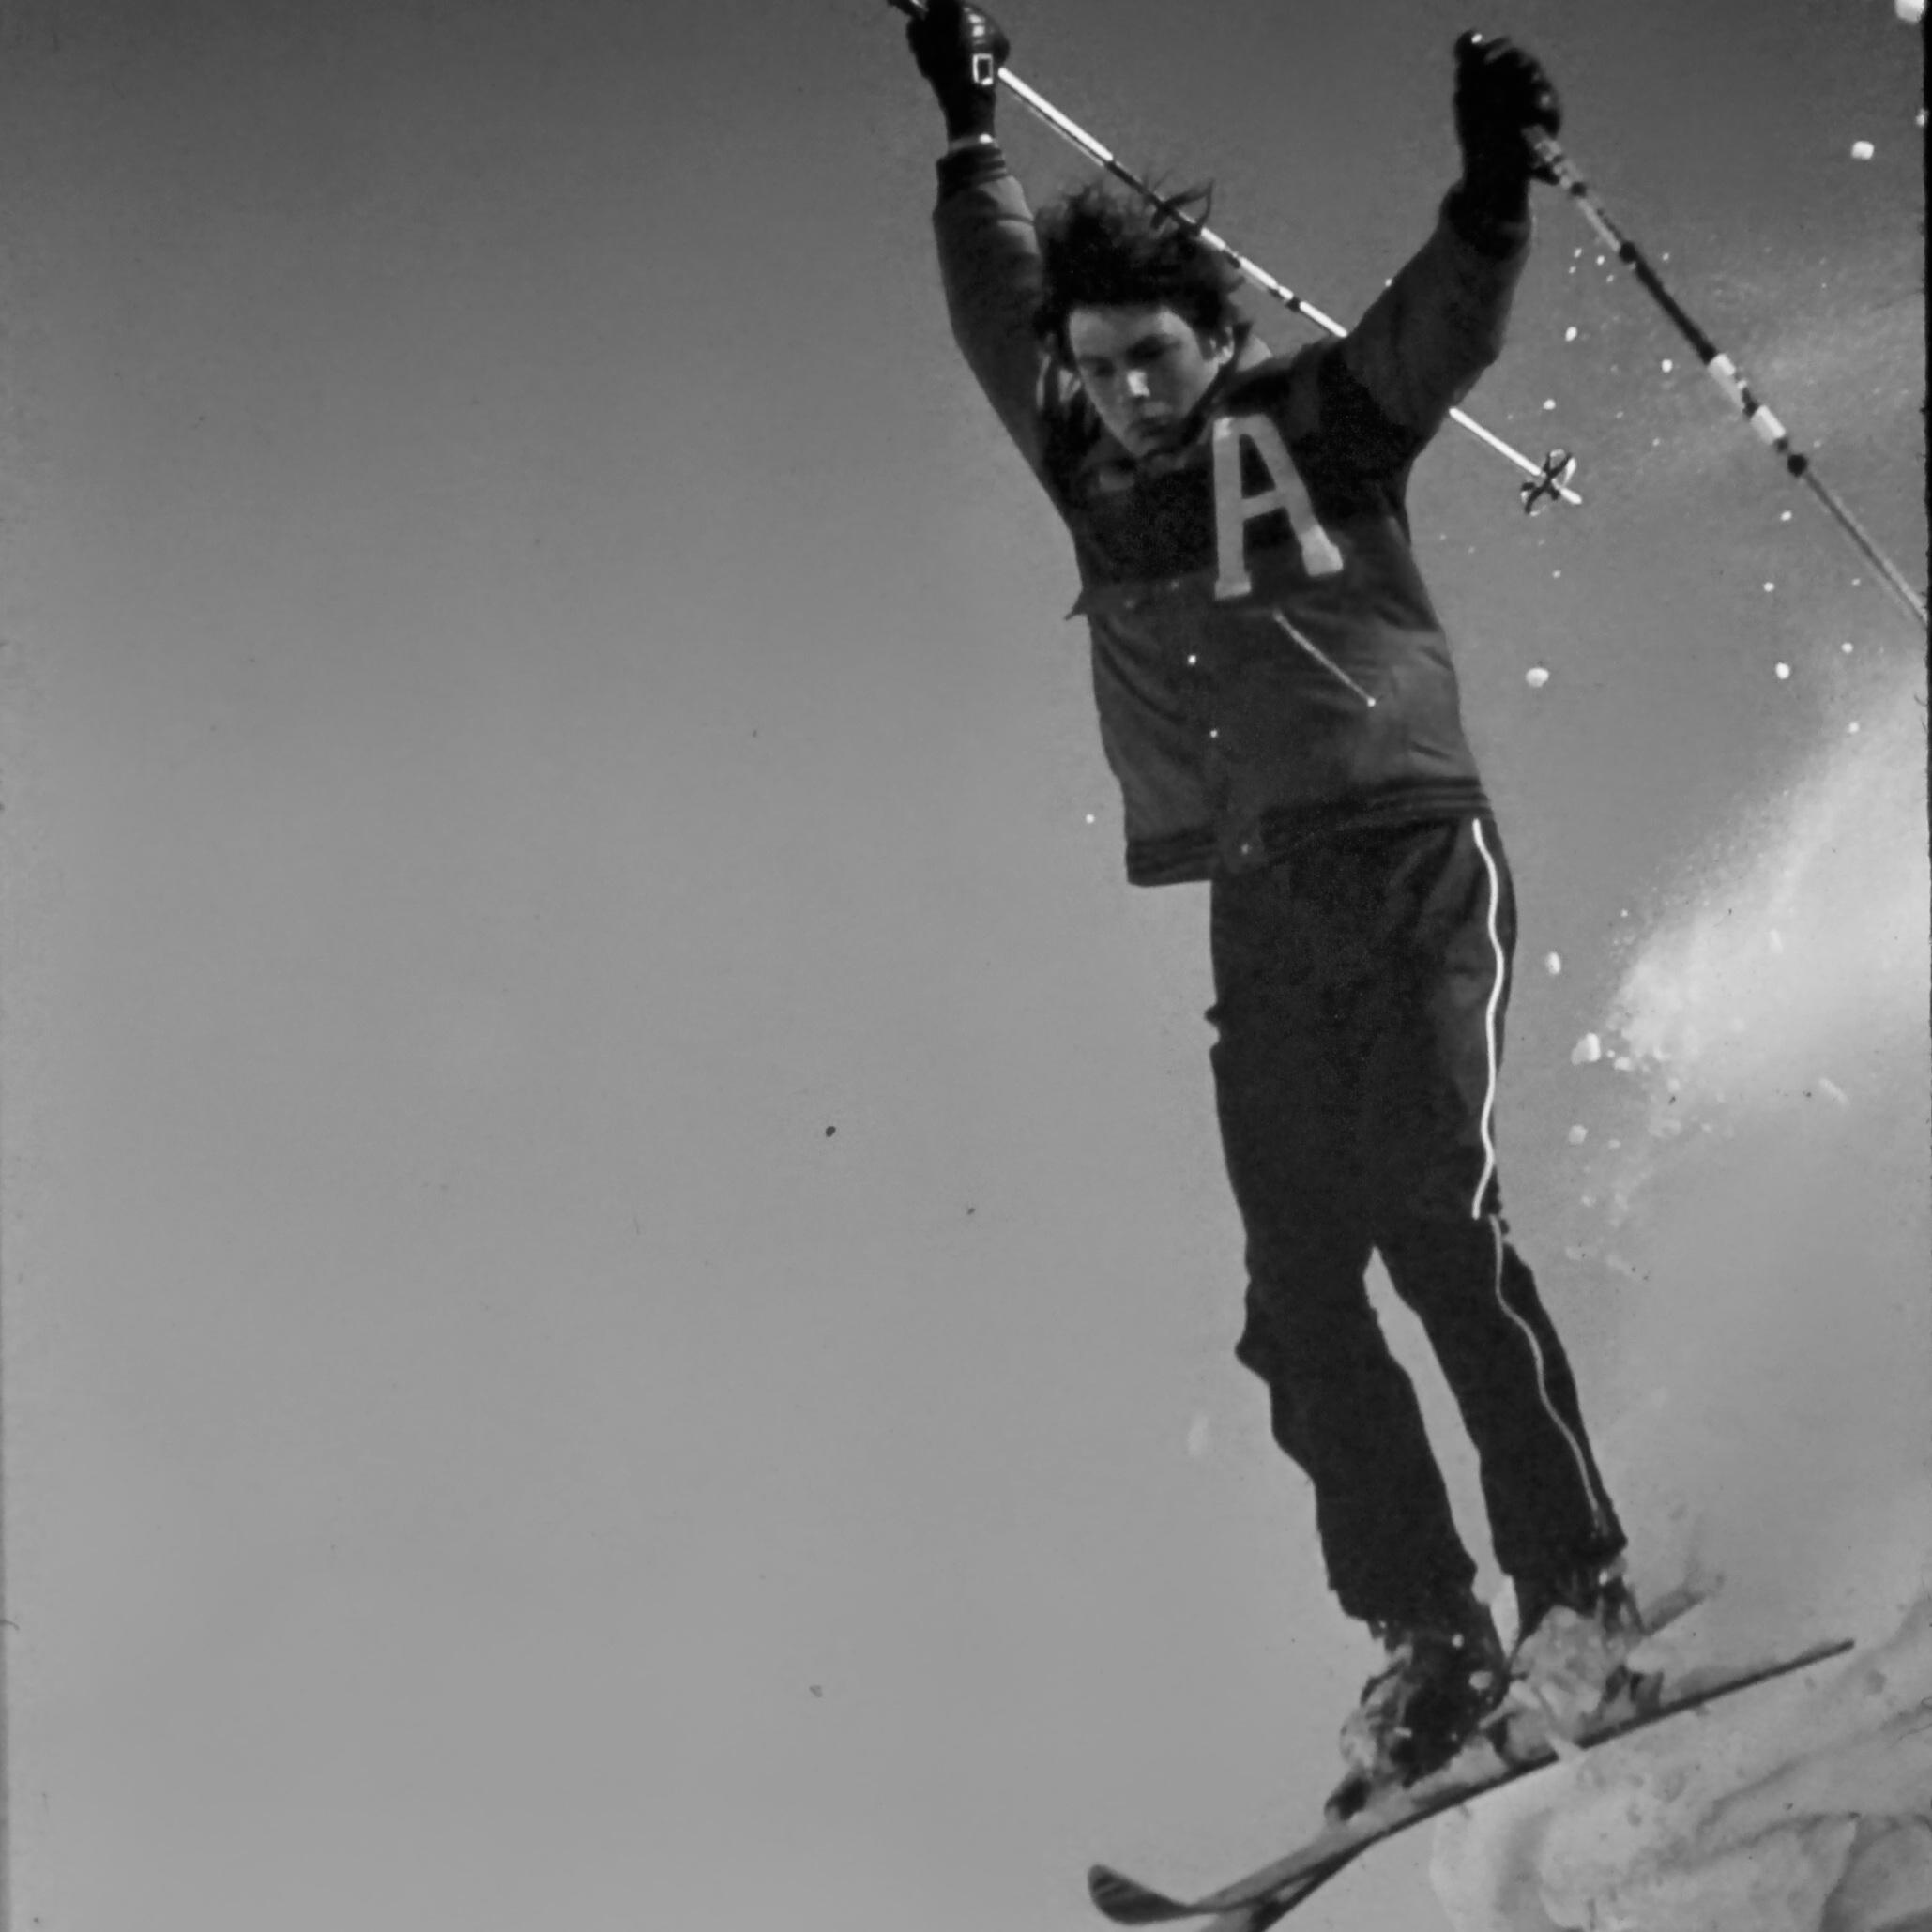 aiglon-skiing copy_HDR copy.jpg